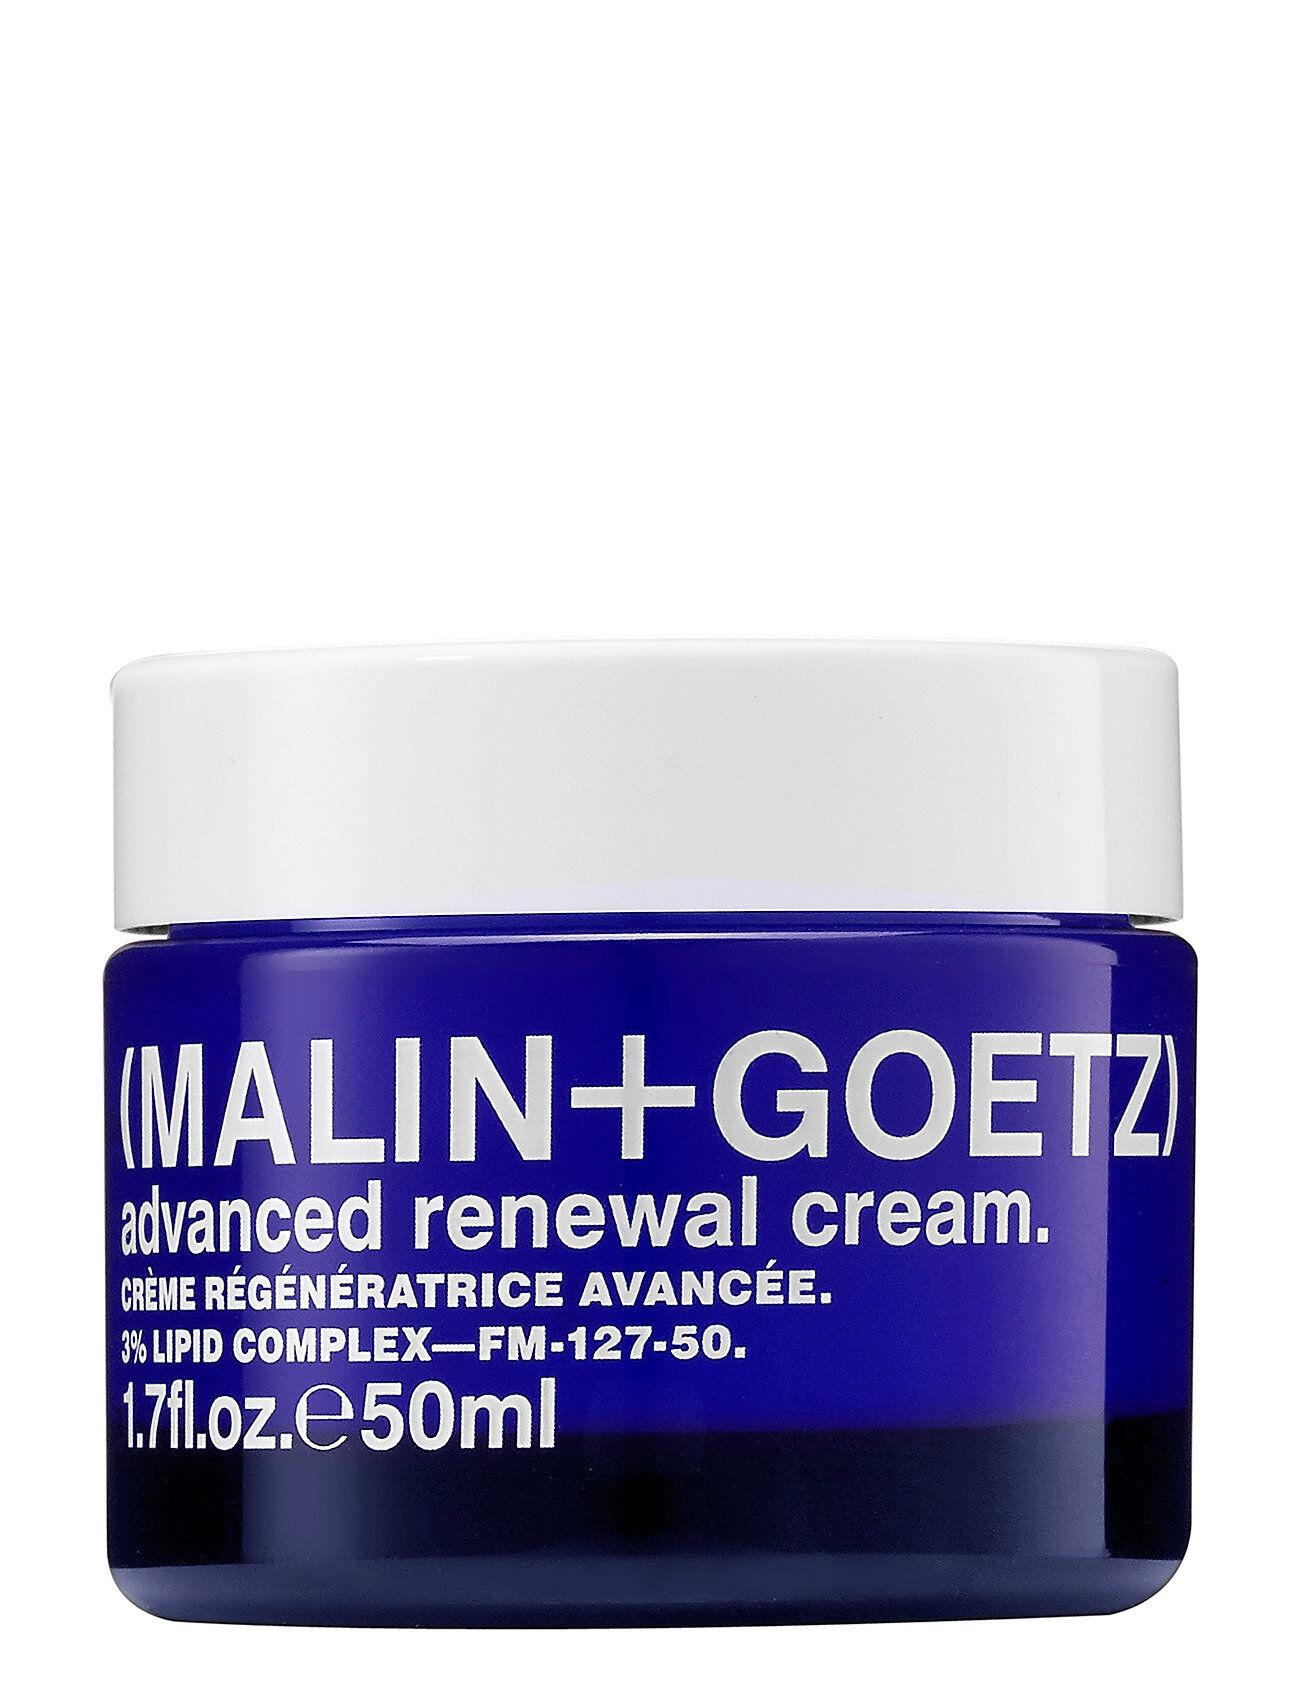 MALIN+GOETZ Advanced Renewal Cream Kosteusvoide Kasvovoide Ihonhoito Nude MALIN+GOETZ